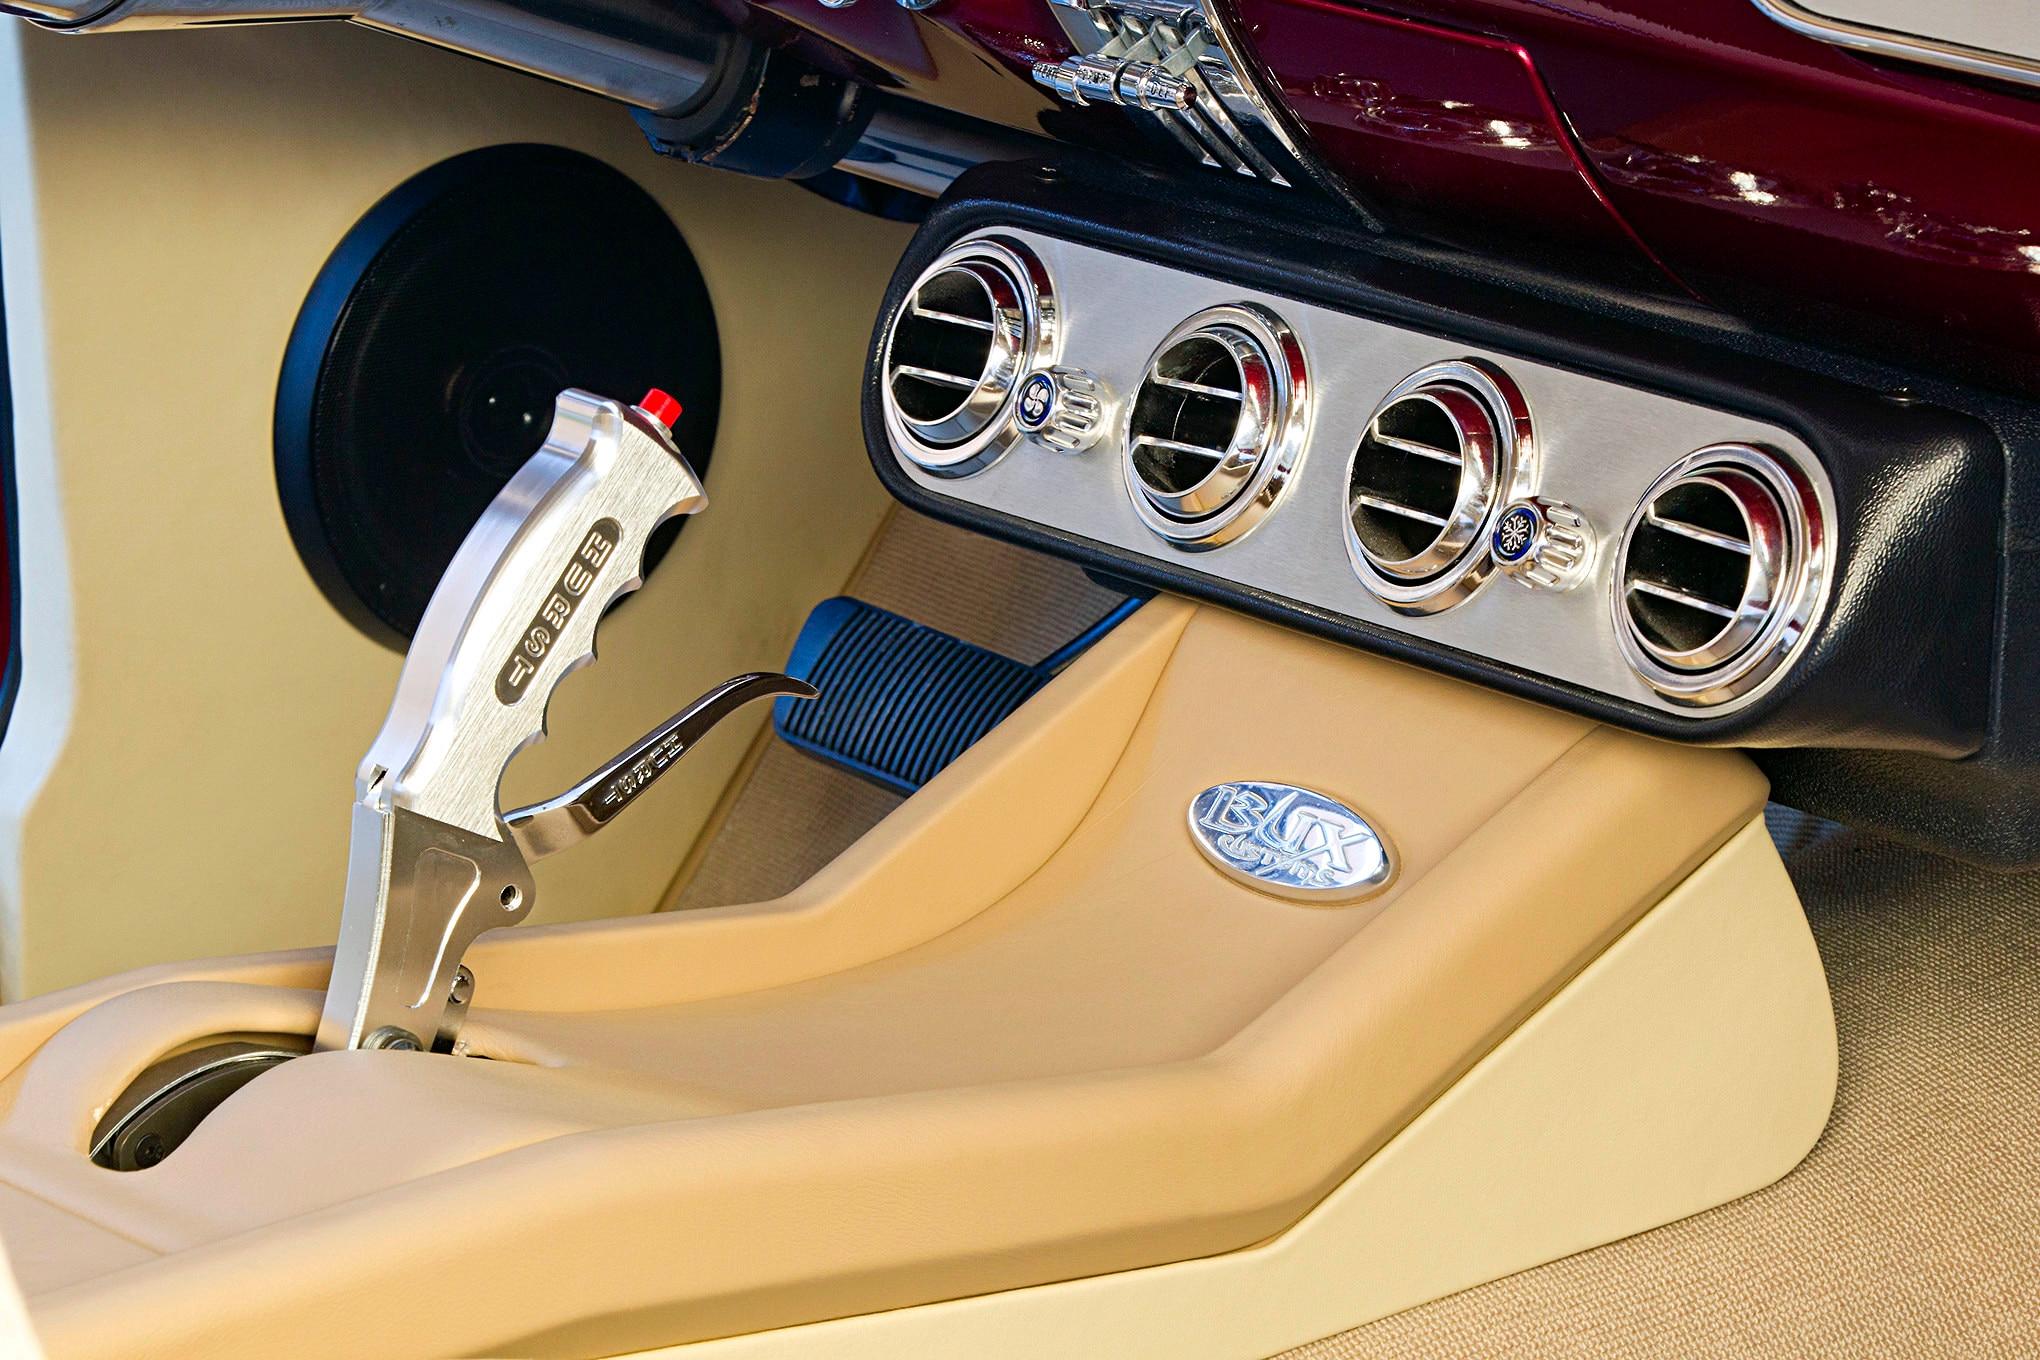 028 1966 Mustang Shifter